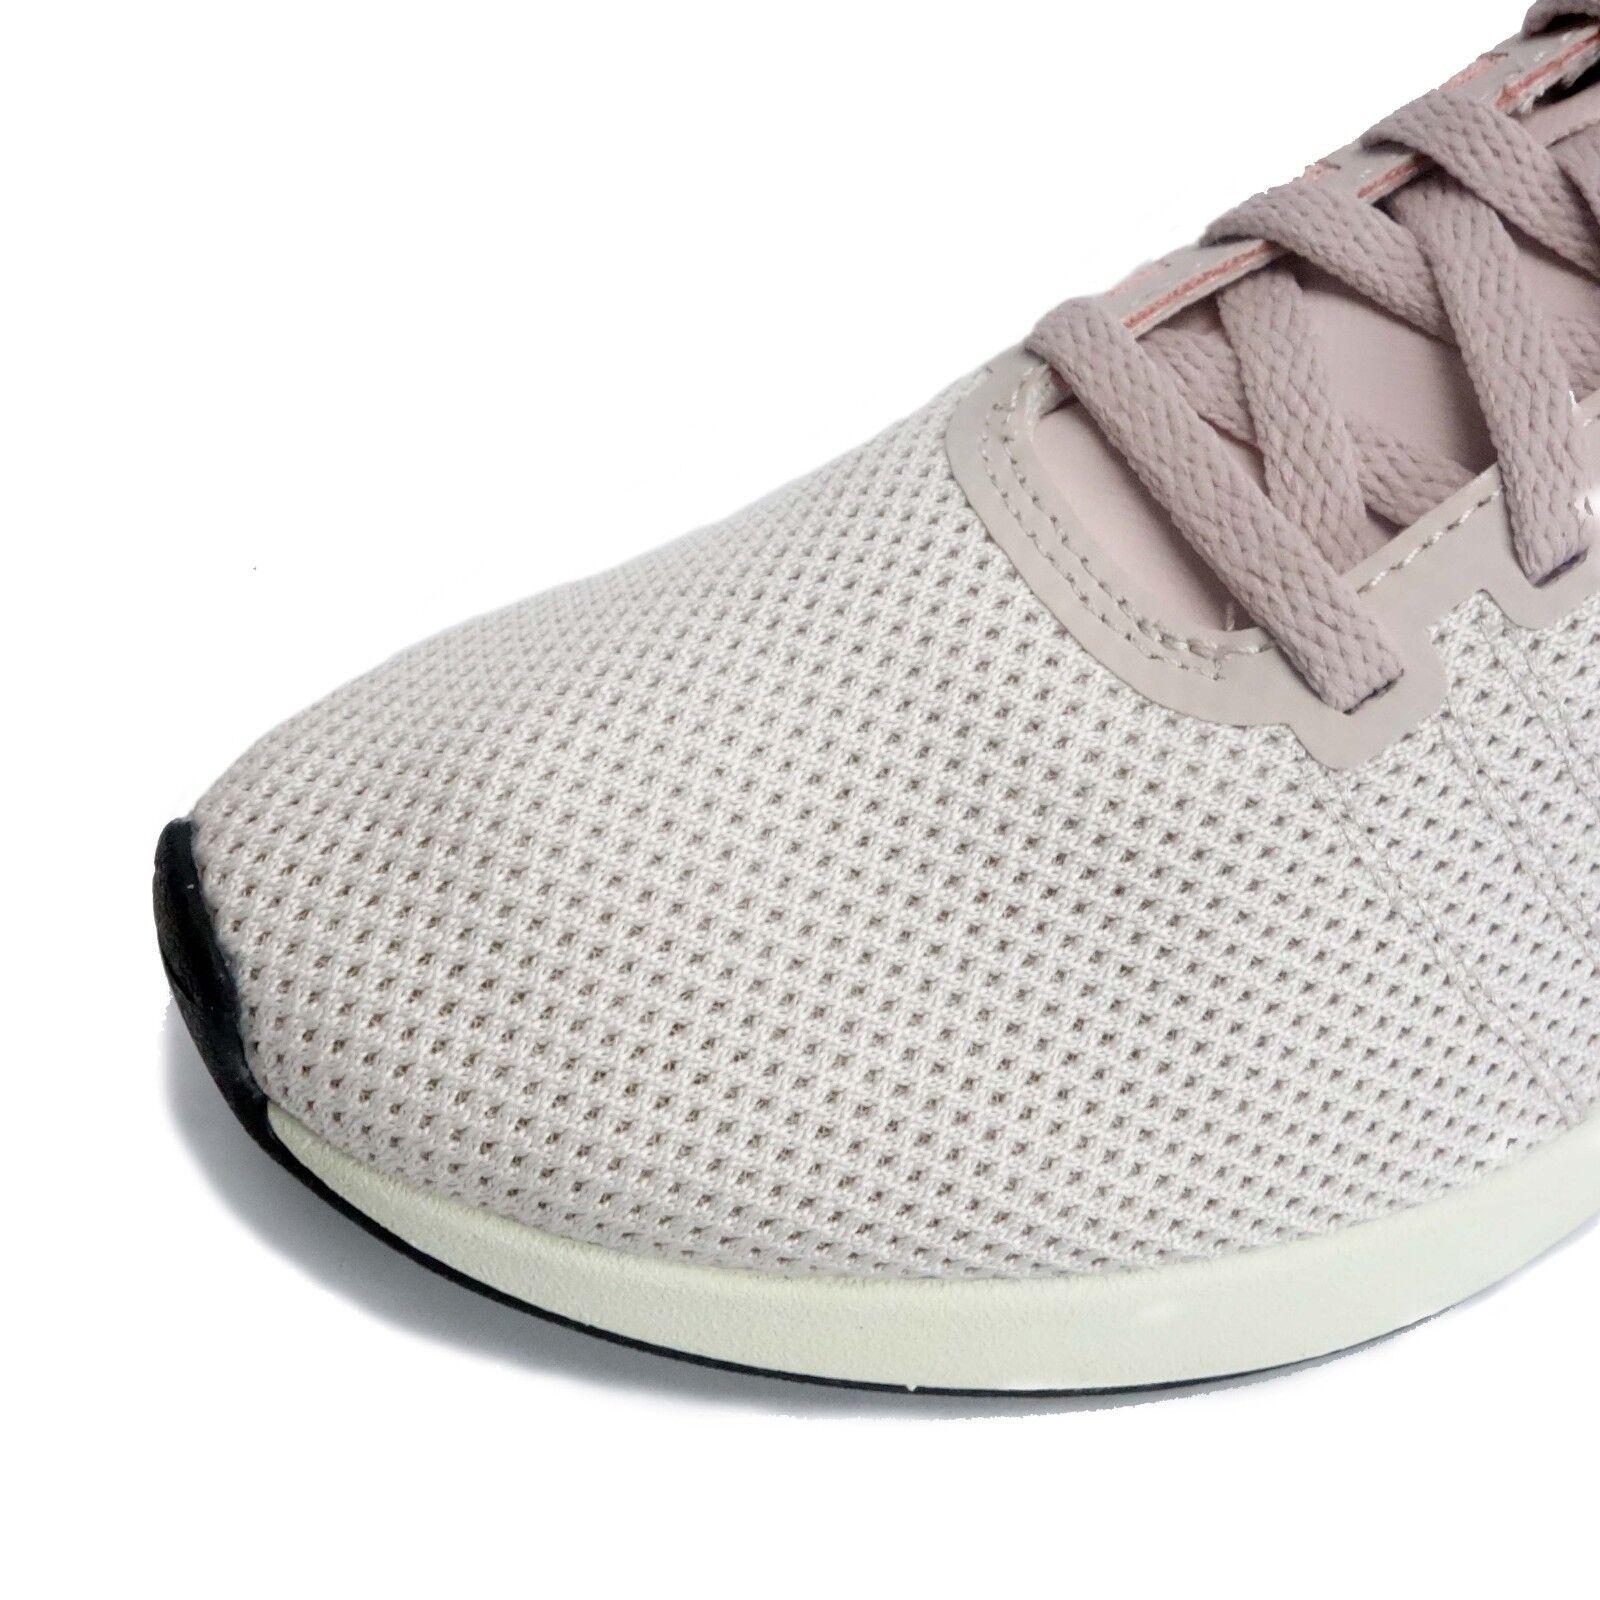 Nike Nike Nike dualtone RACER donna scarpe Limo rosso Stardust 4a1df0